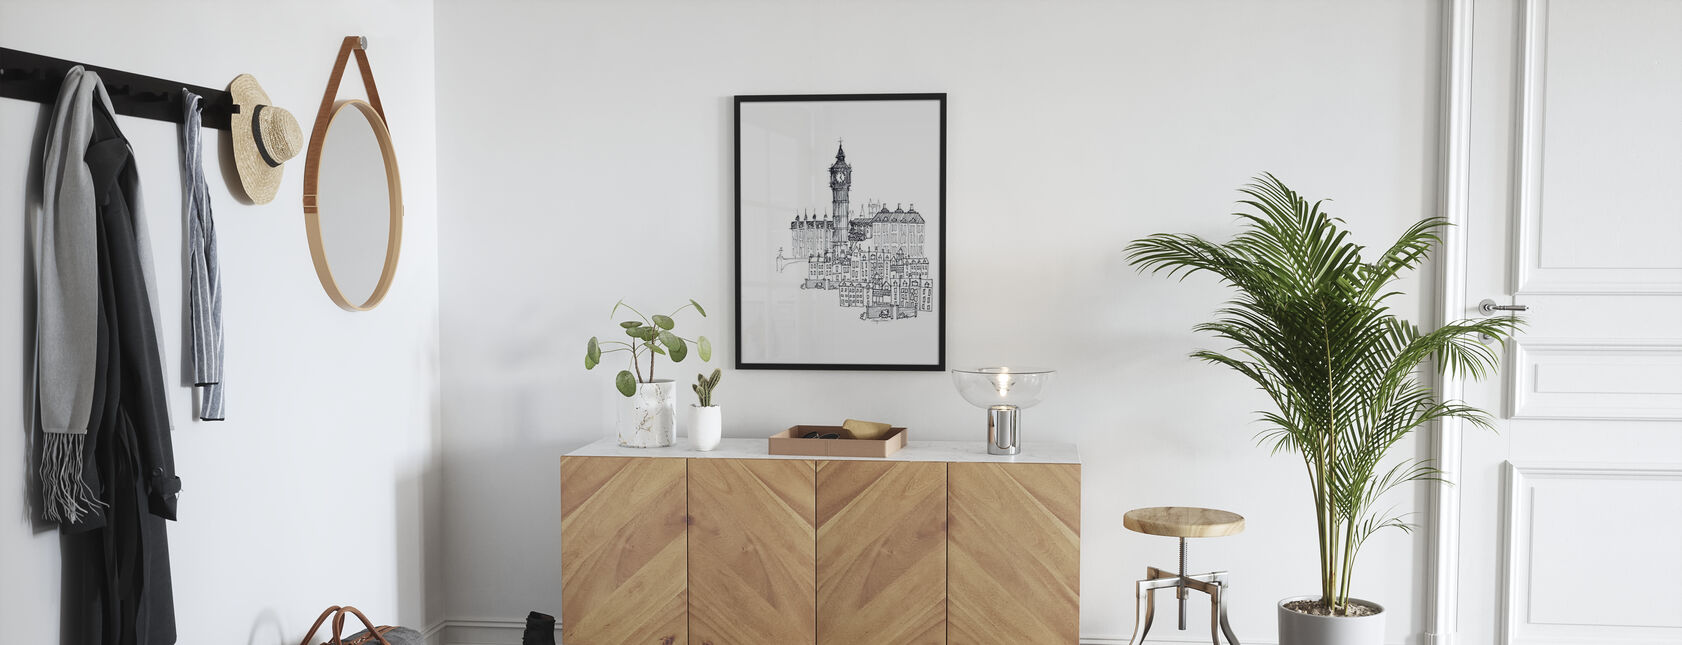 Avery Tillmon - Big Ben - Poster - Sala